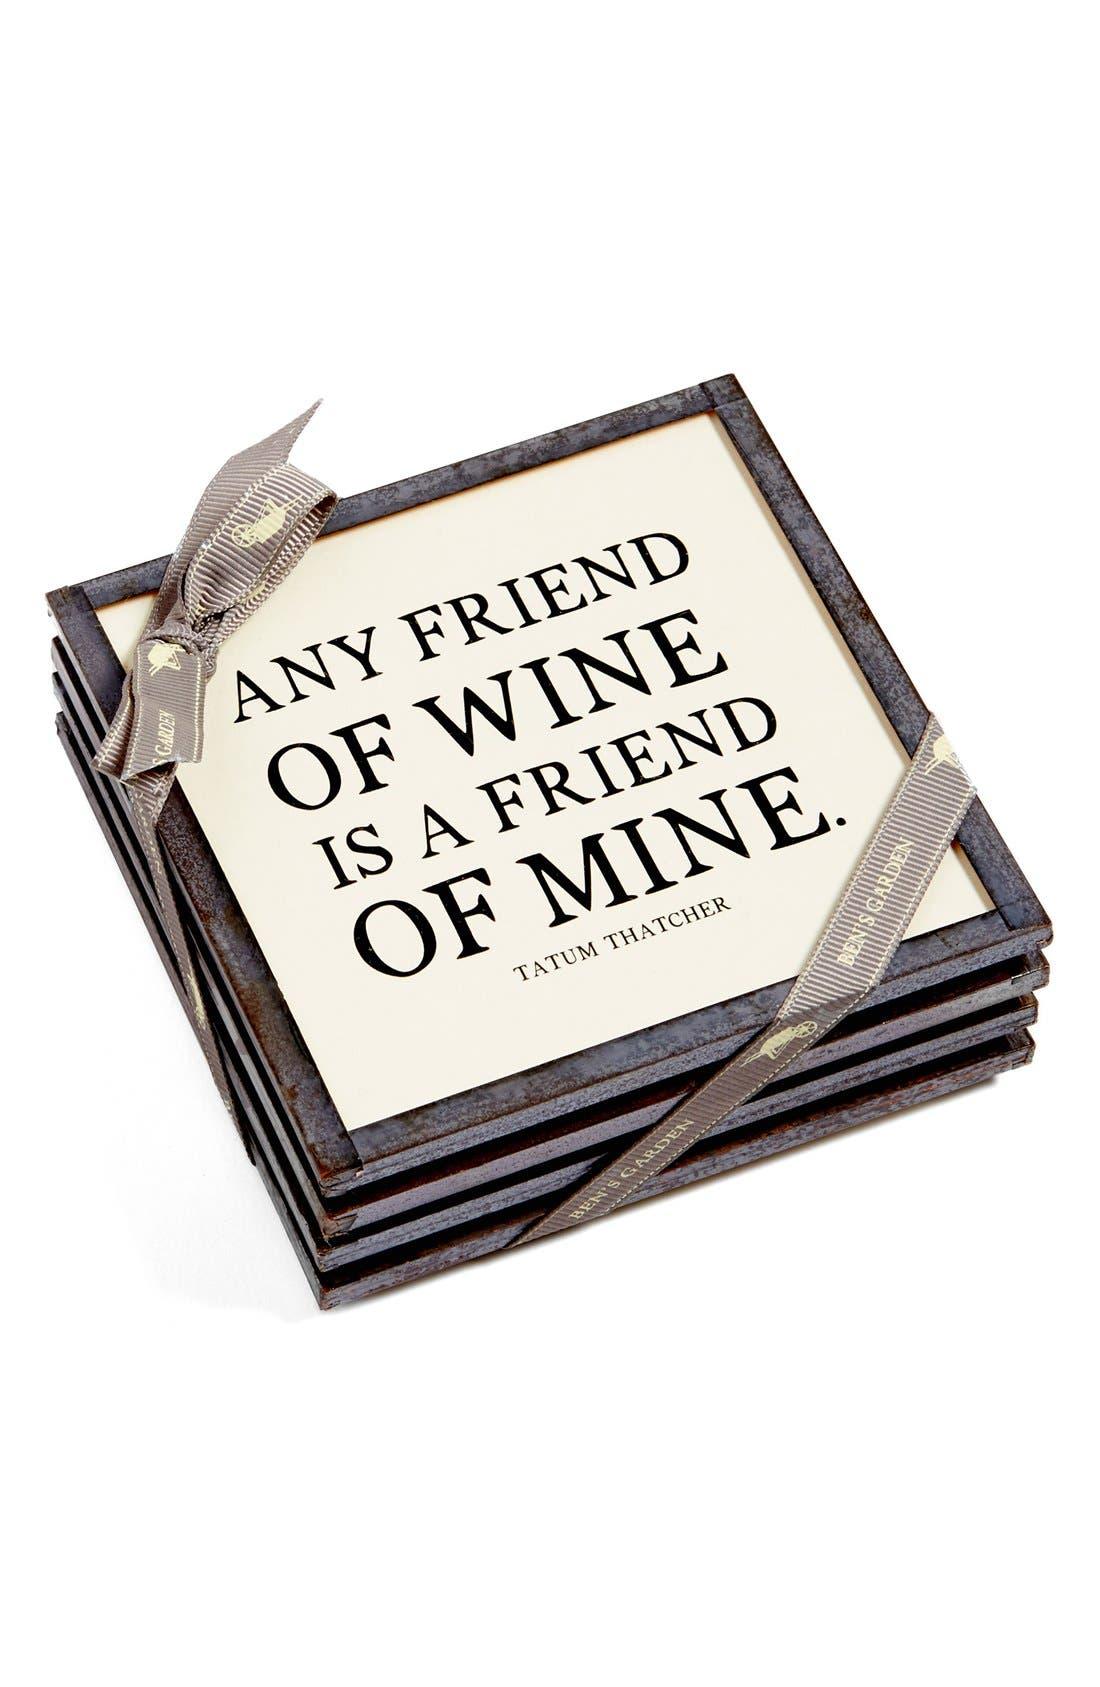 Alternate Image 2  - Ben's Garden 'Any Friend of Wine' Coasters (Set of 4)